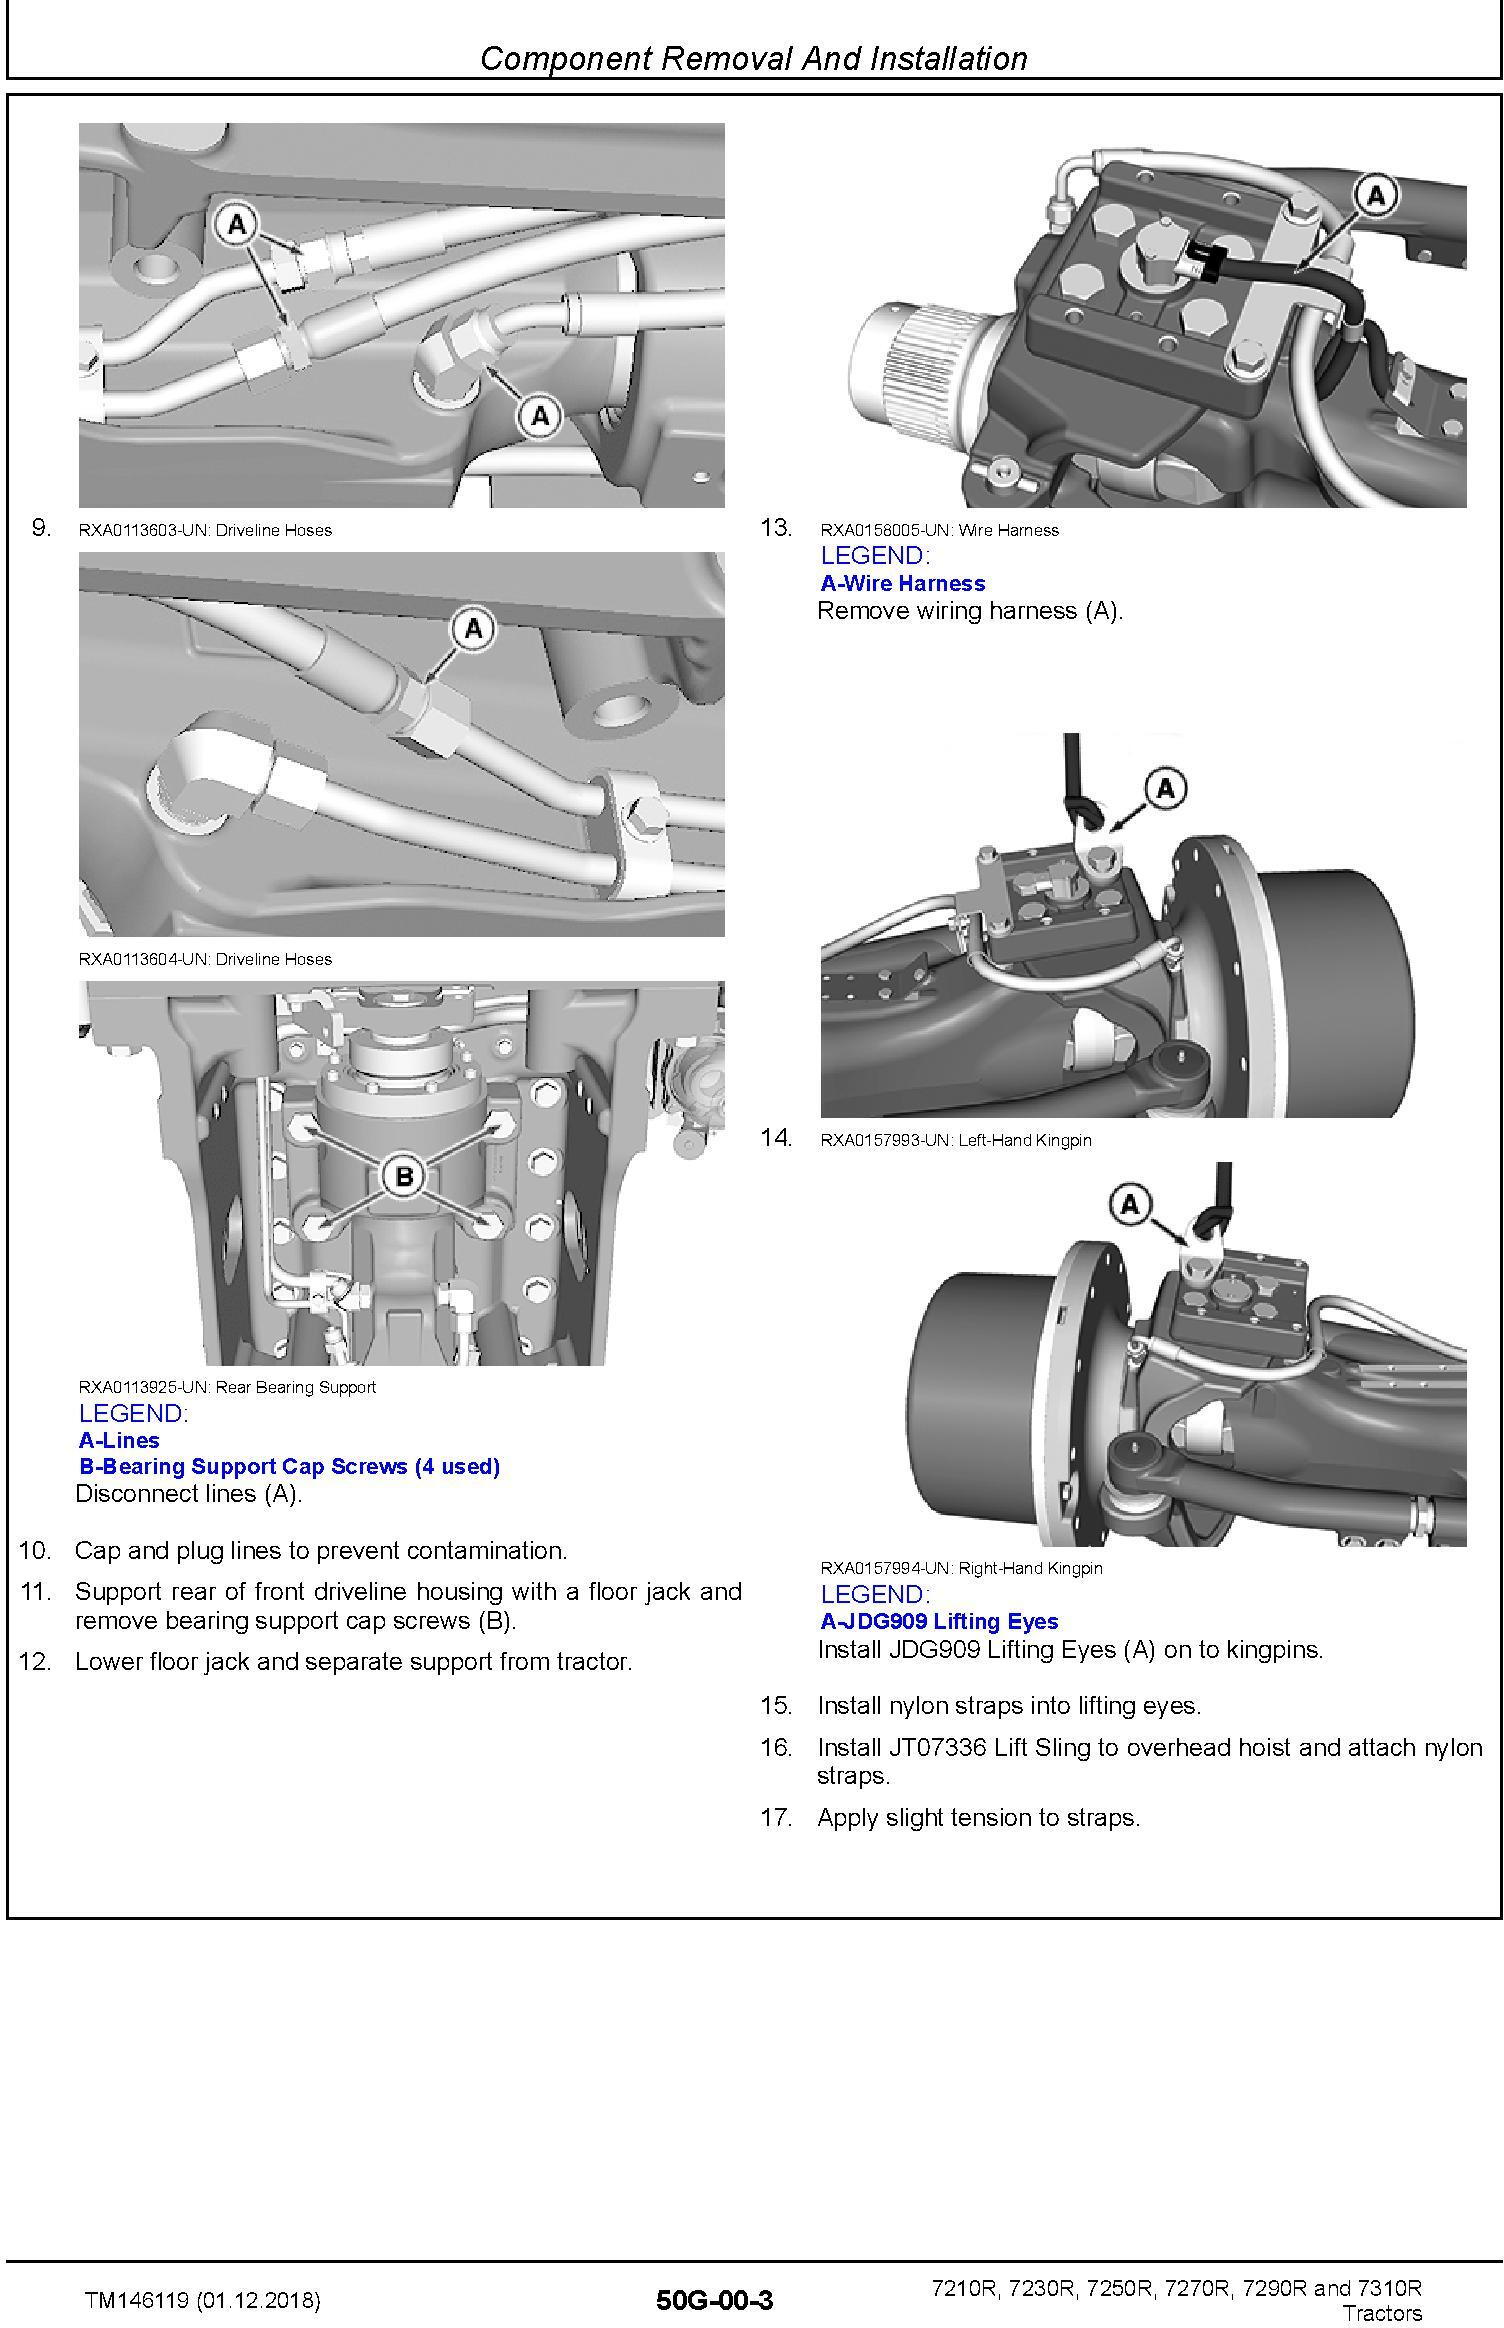 John Deere 7210R 7230R 7250R 7270R 7290R 7310R Tractor (SN.094000-) Repair Technical Manual TM146119 - 2